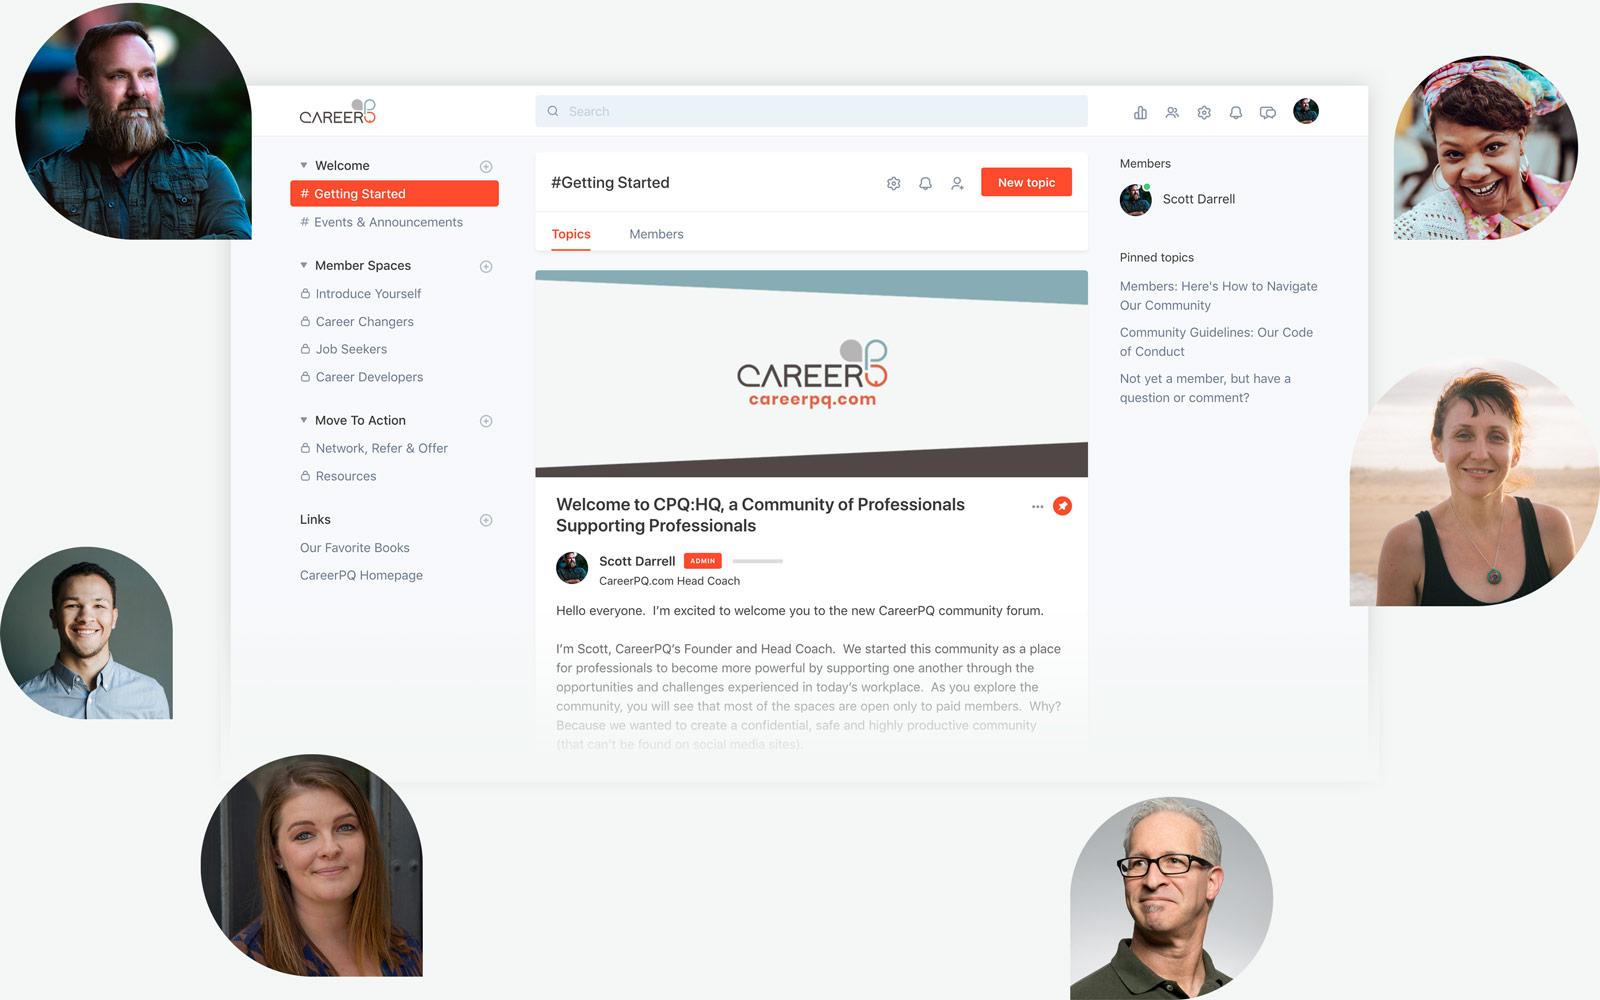 Screenshot of the CPQ:HQ Community main page